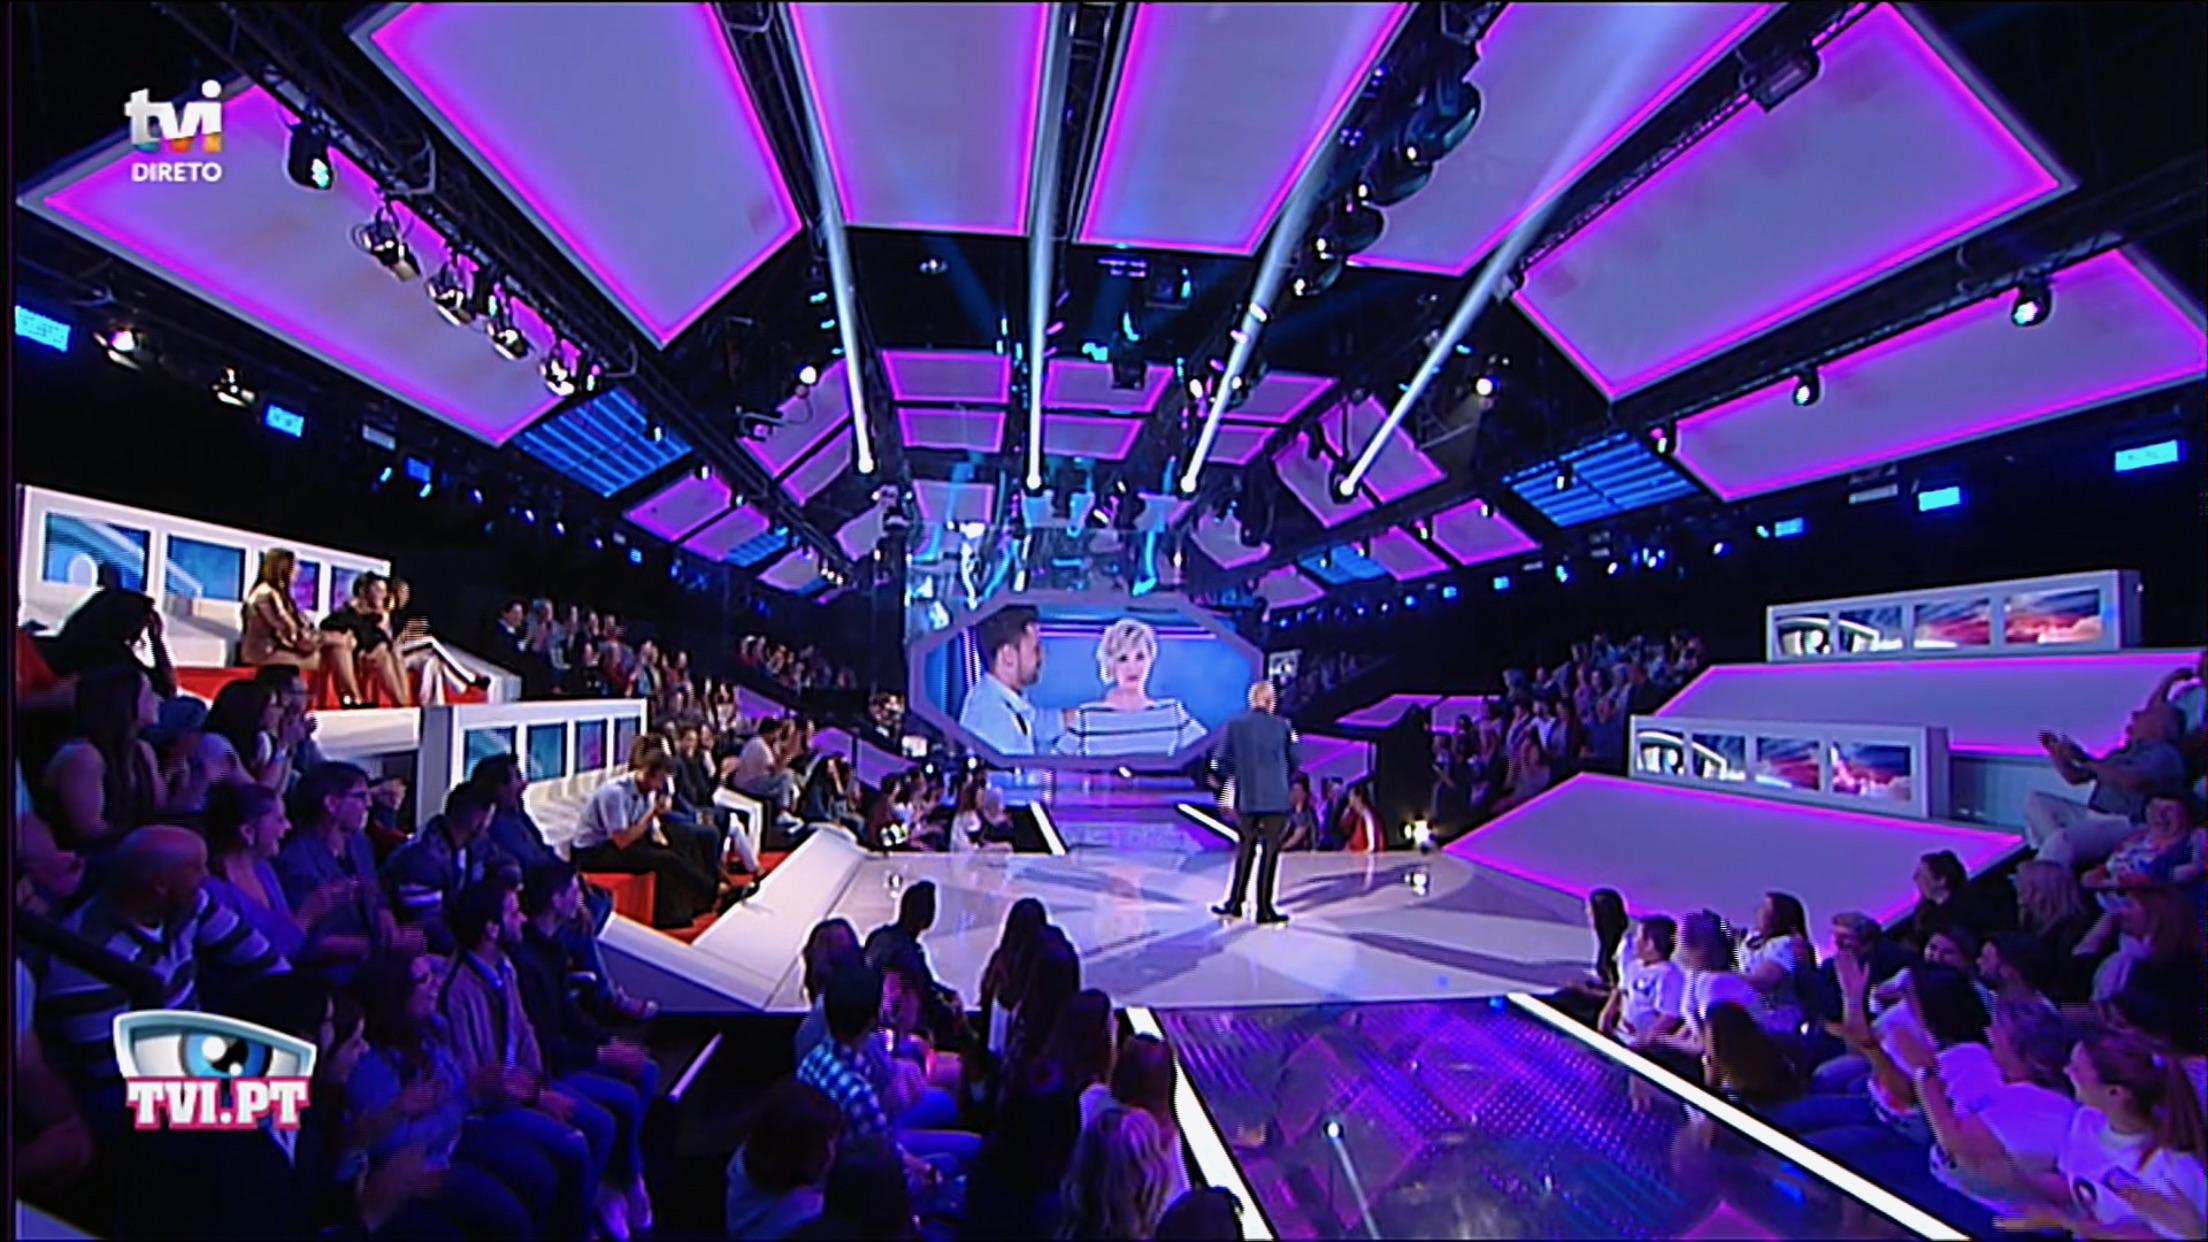 Casa Dos Segredos Cristina Ferreira Rui 9 Rui Tanto Pediu E Cristina Ferreira Entrou Na «Casa Dos Segredos 7»